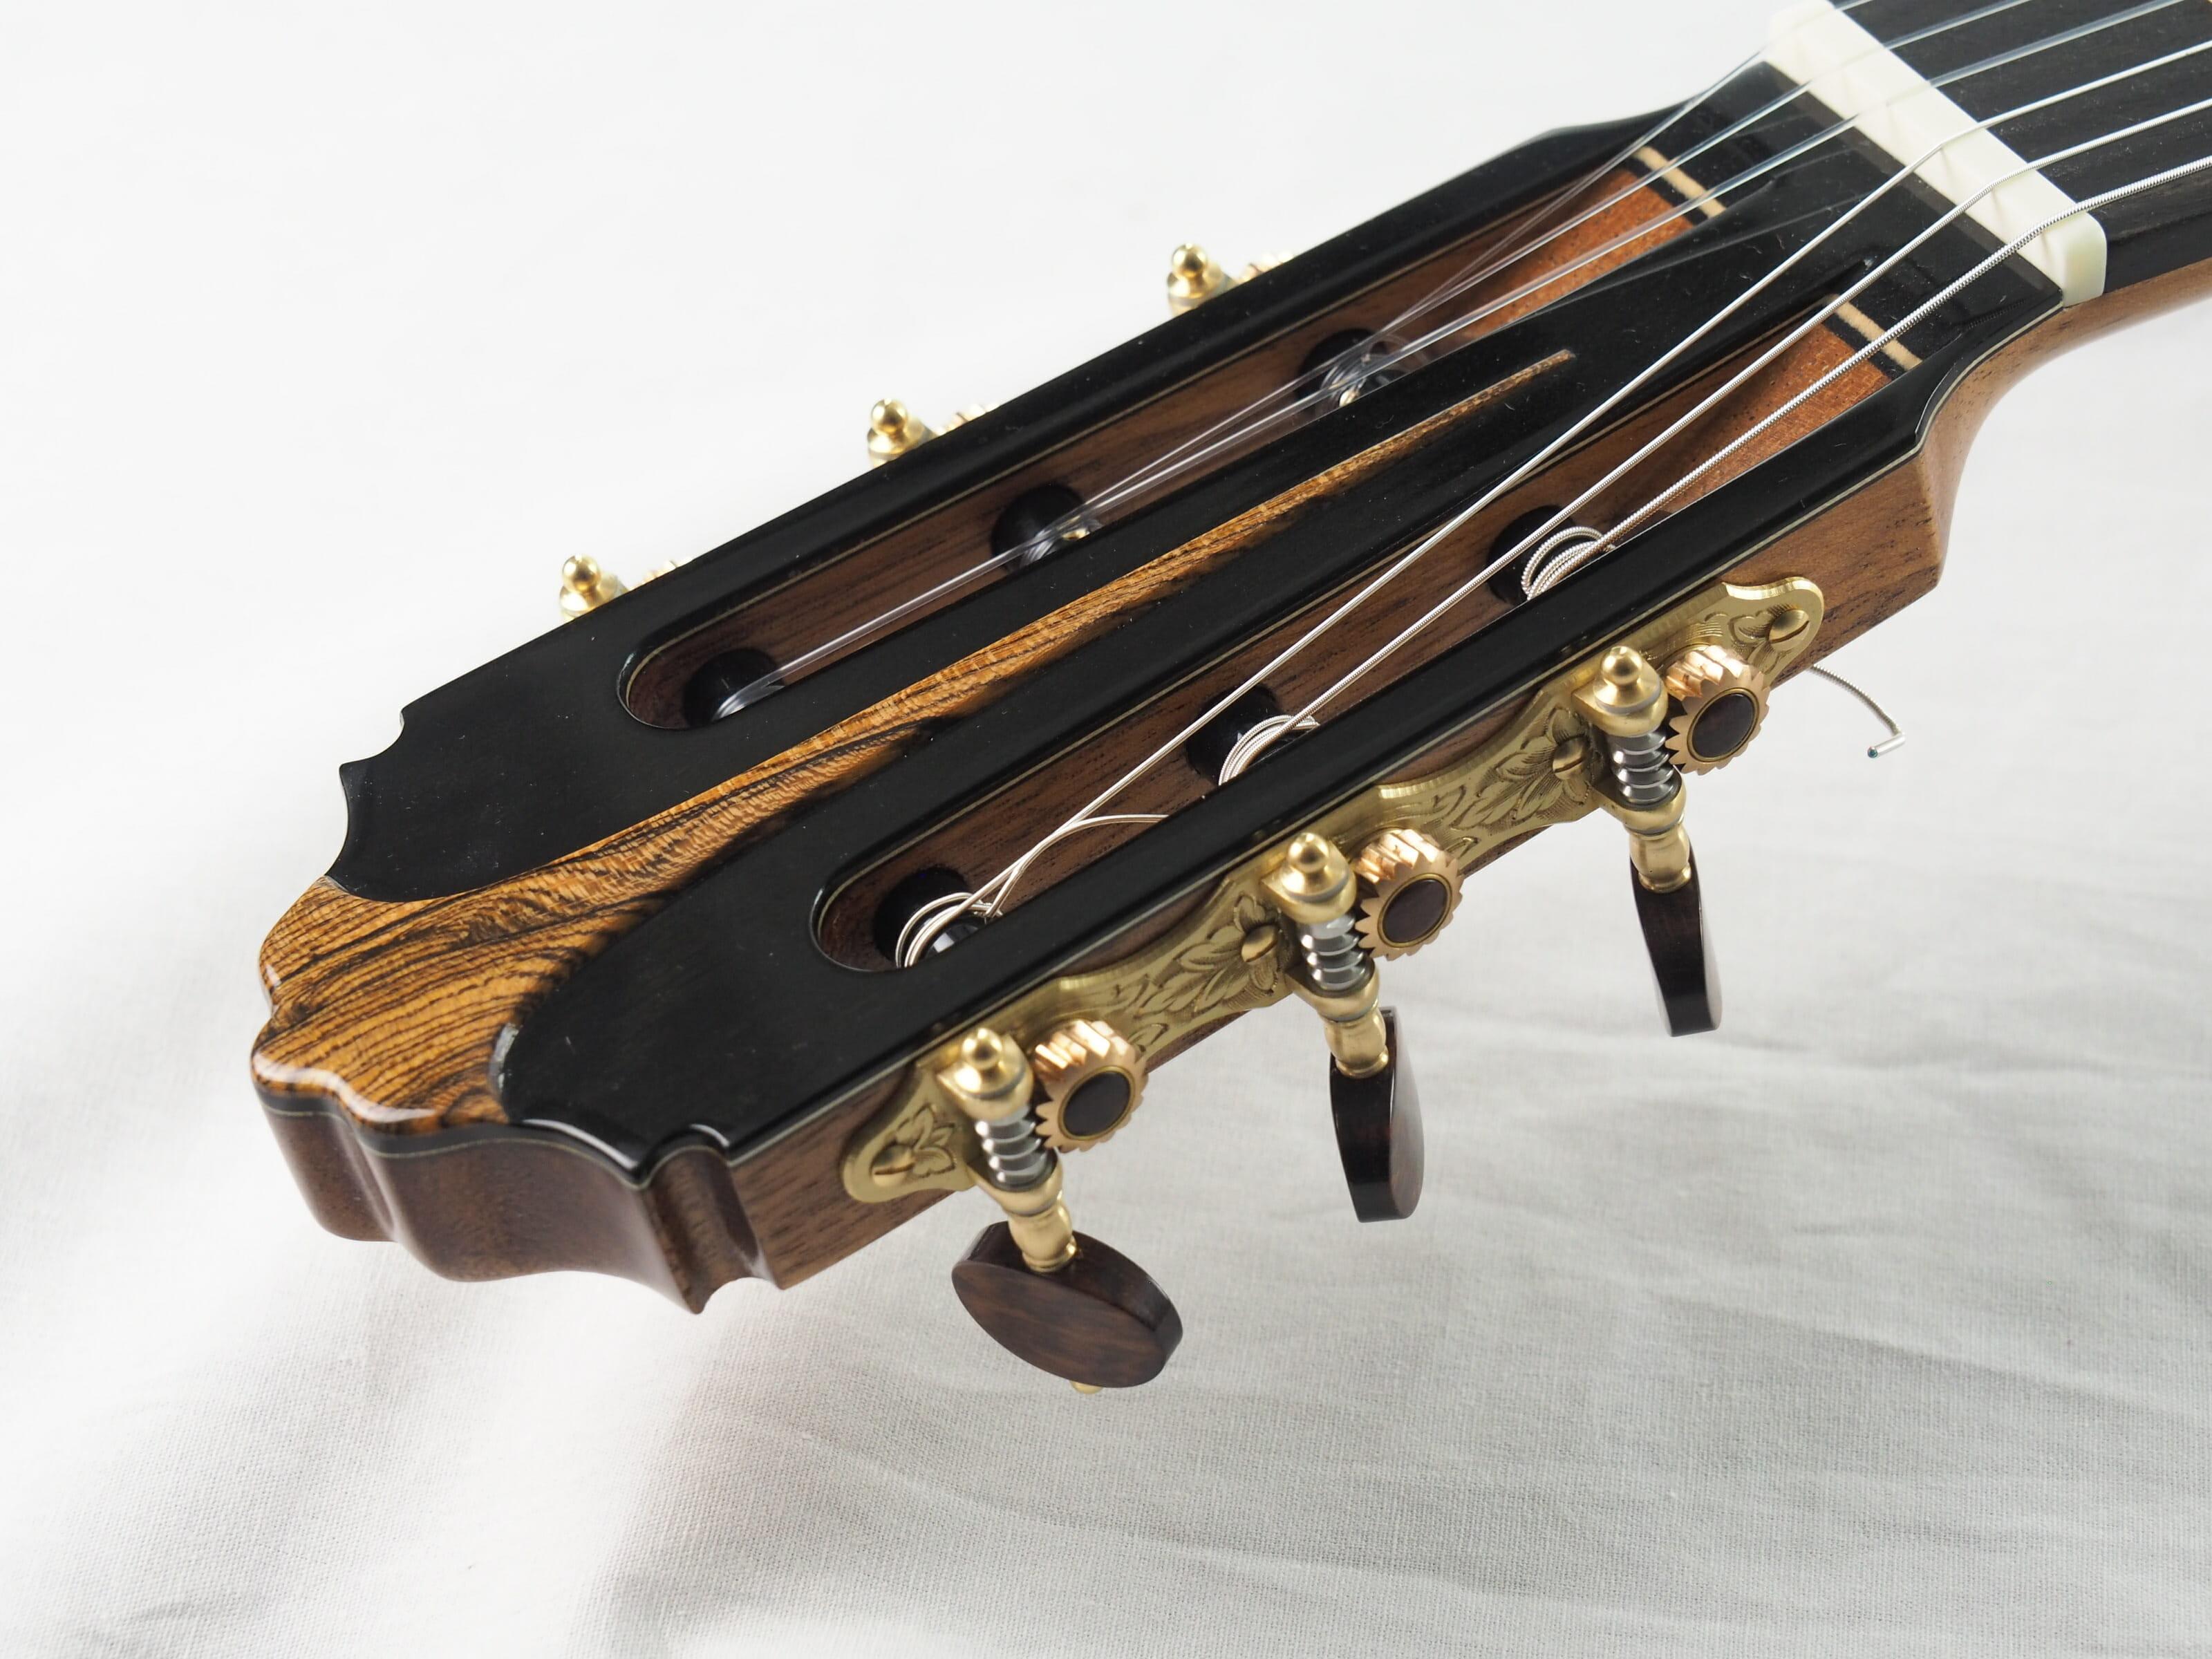 Luthier Charalampos Koumridis guitare classique N°139 19KOU139-01